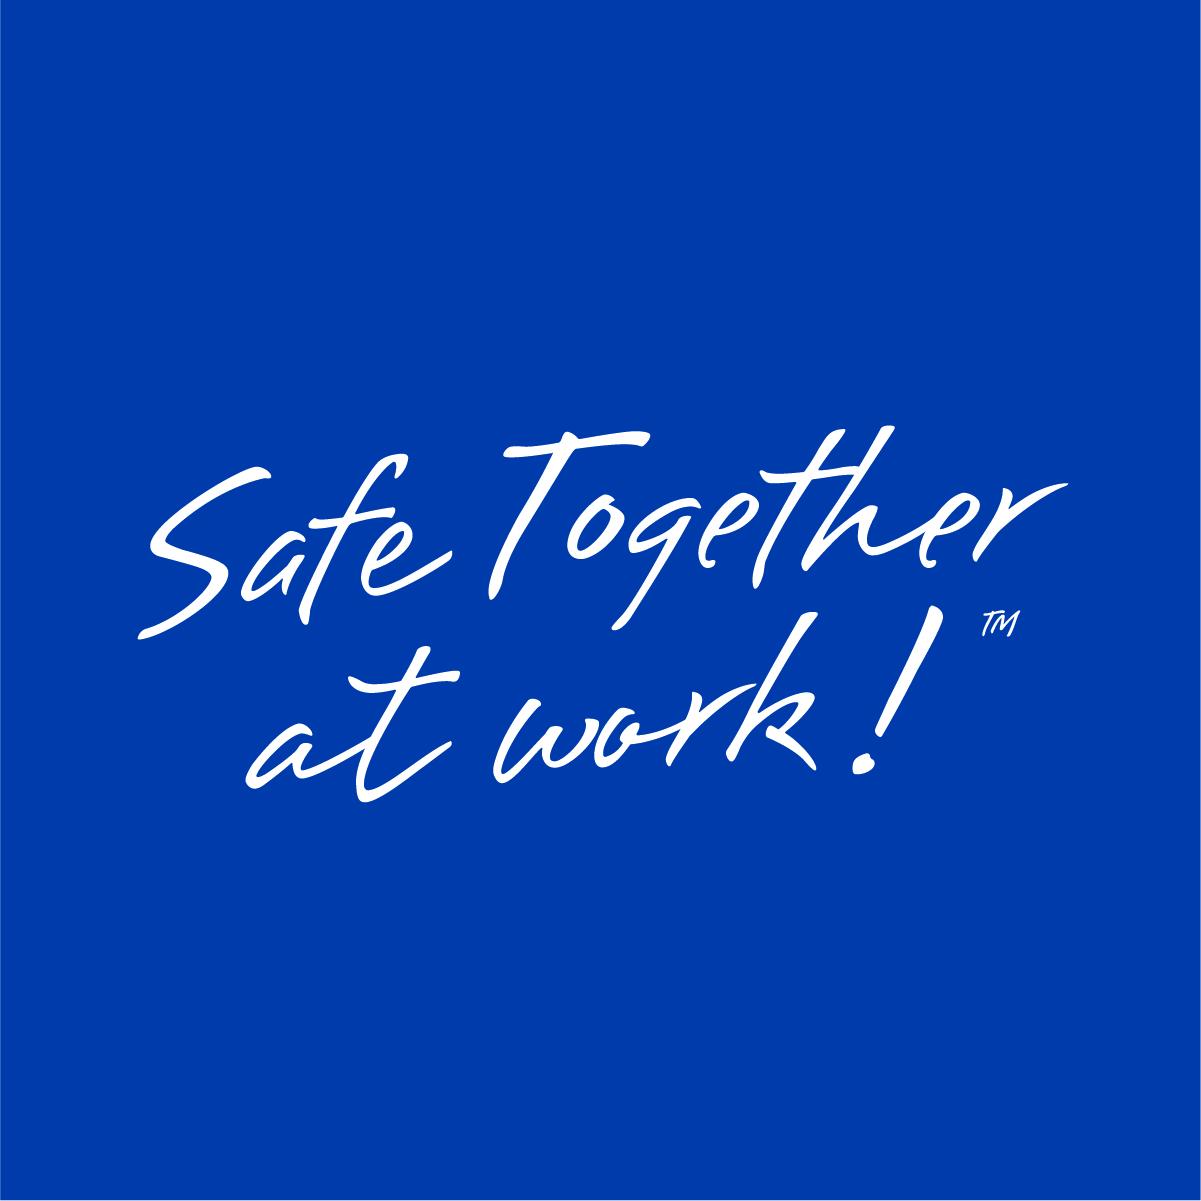 Safe Together at Work - Graphic